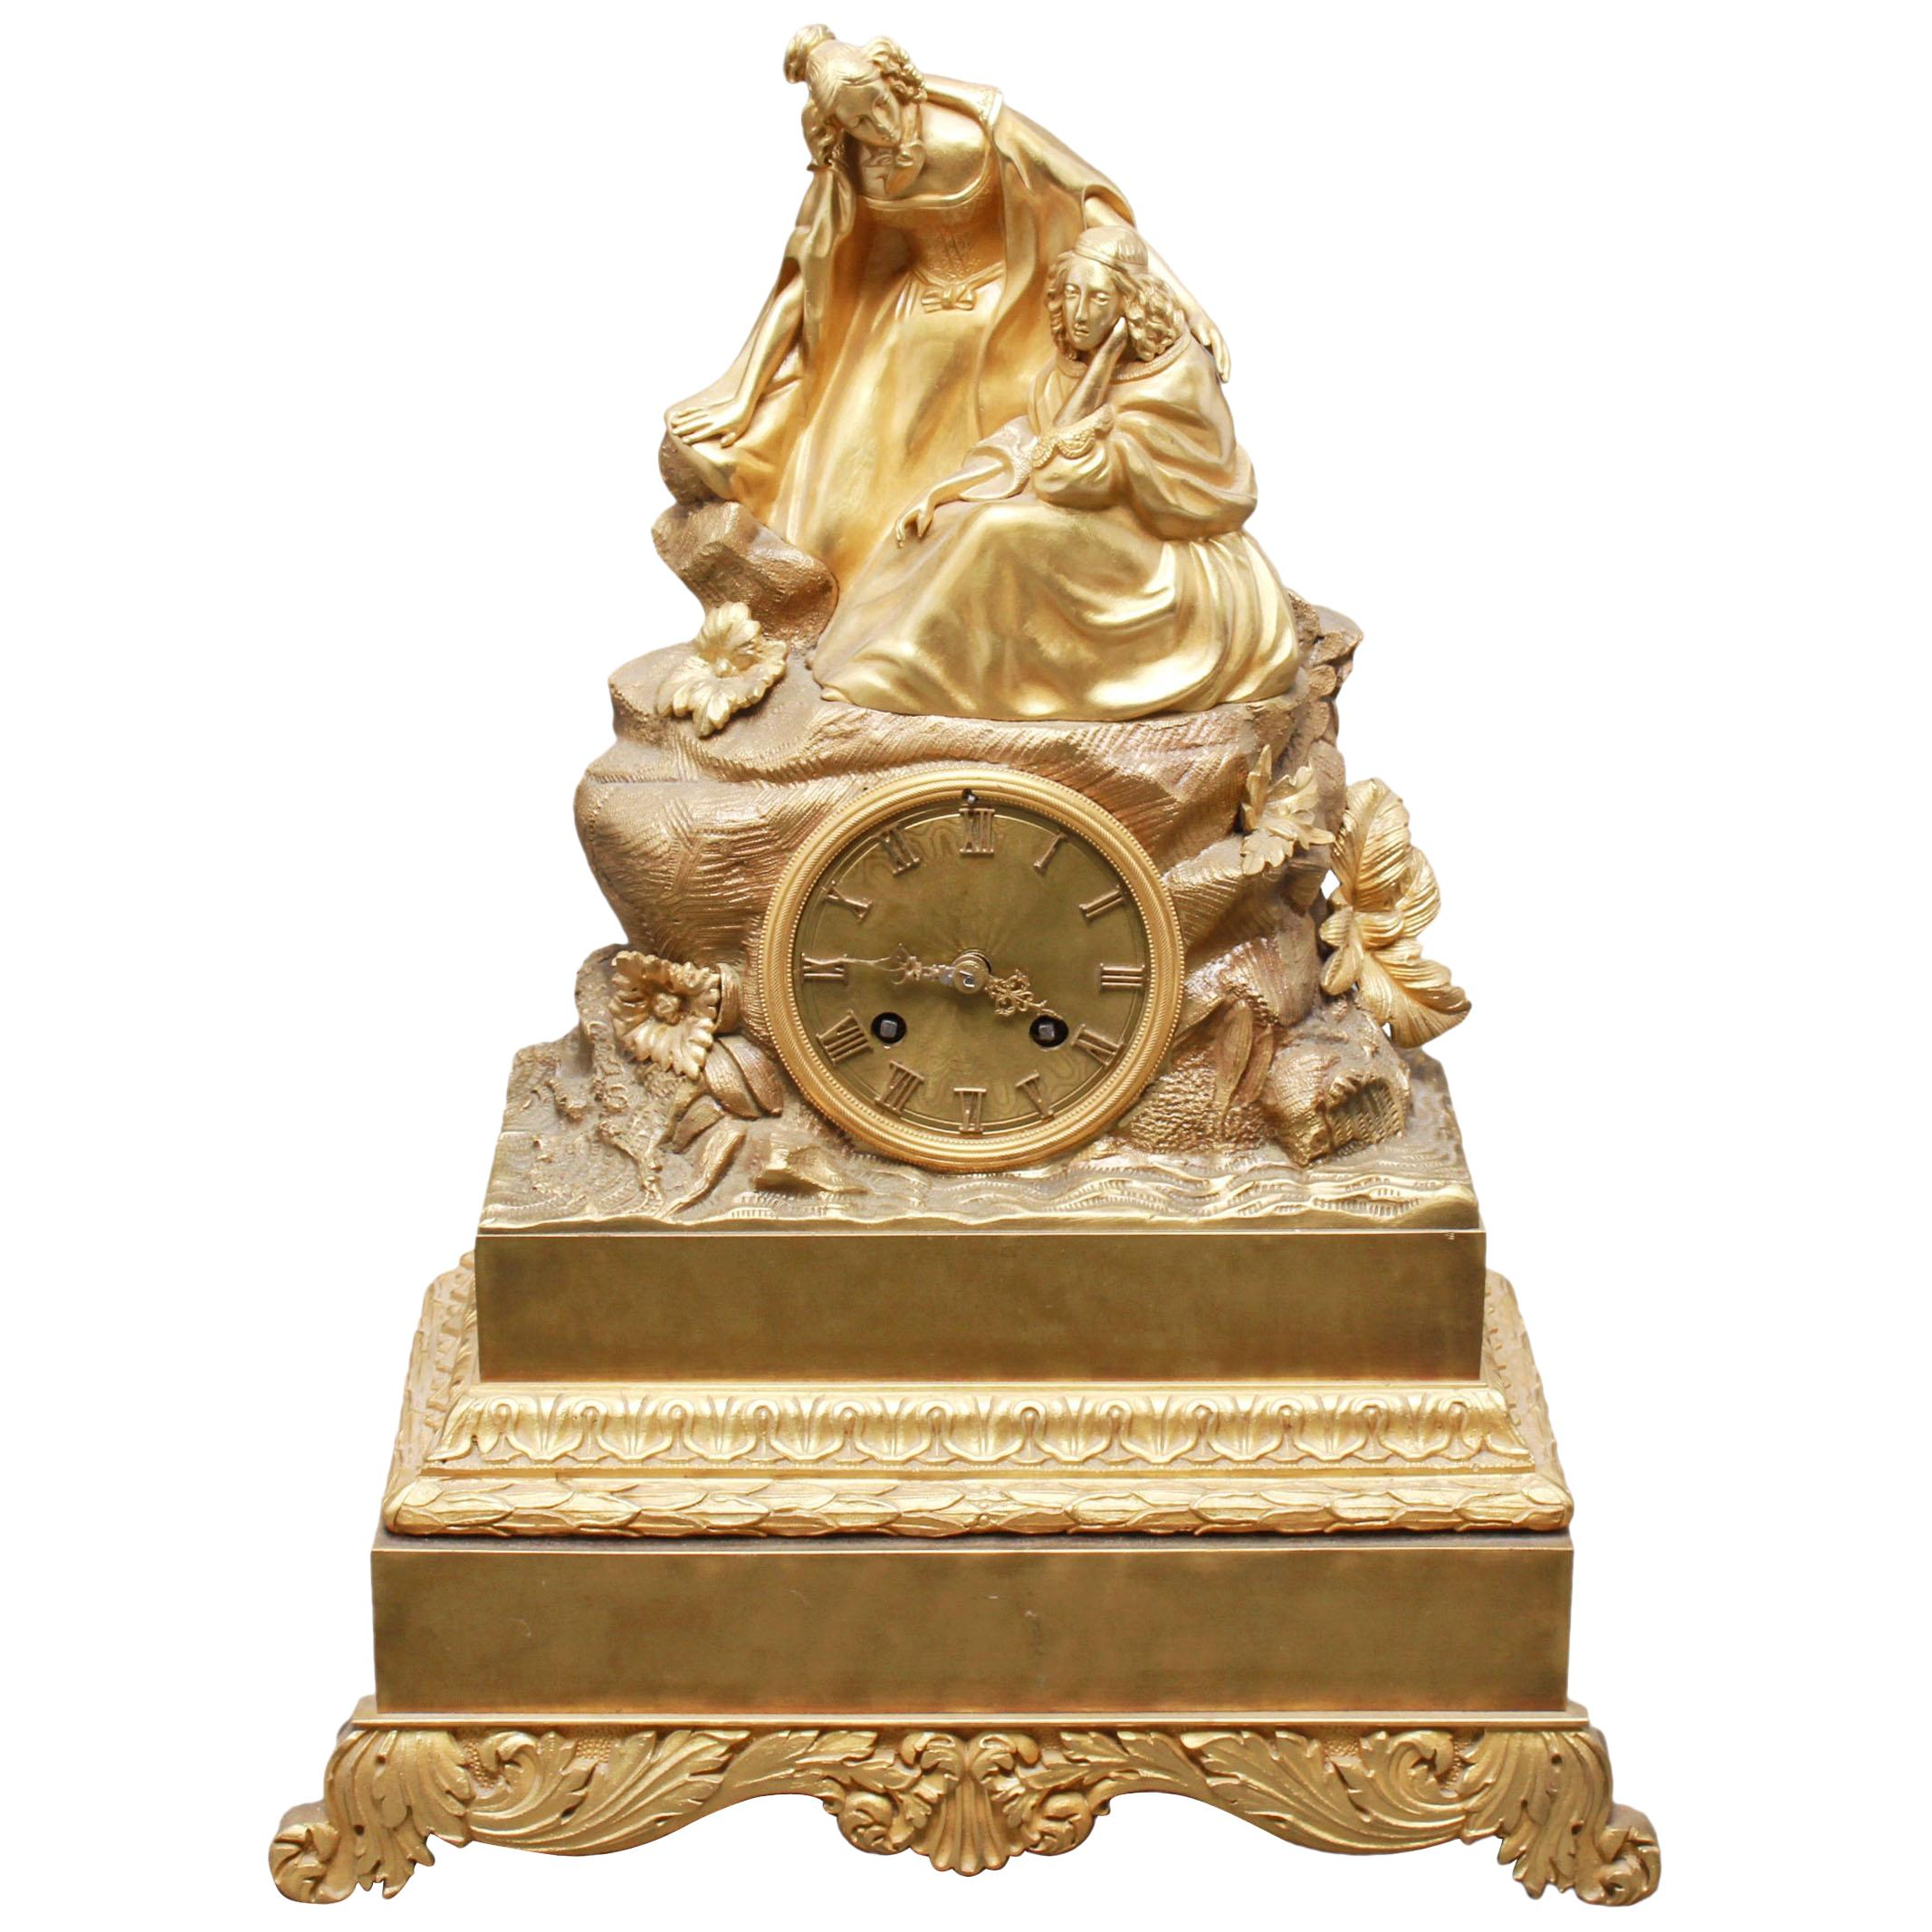 Charles Pickard French Neoclassical Revival Ormolu Gilt Bronze Mantel Clock